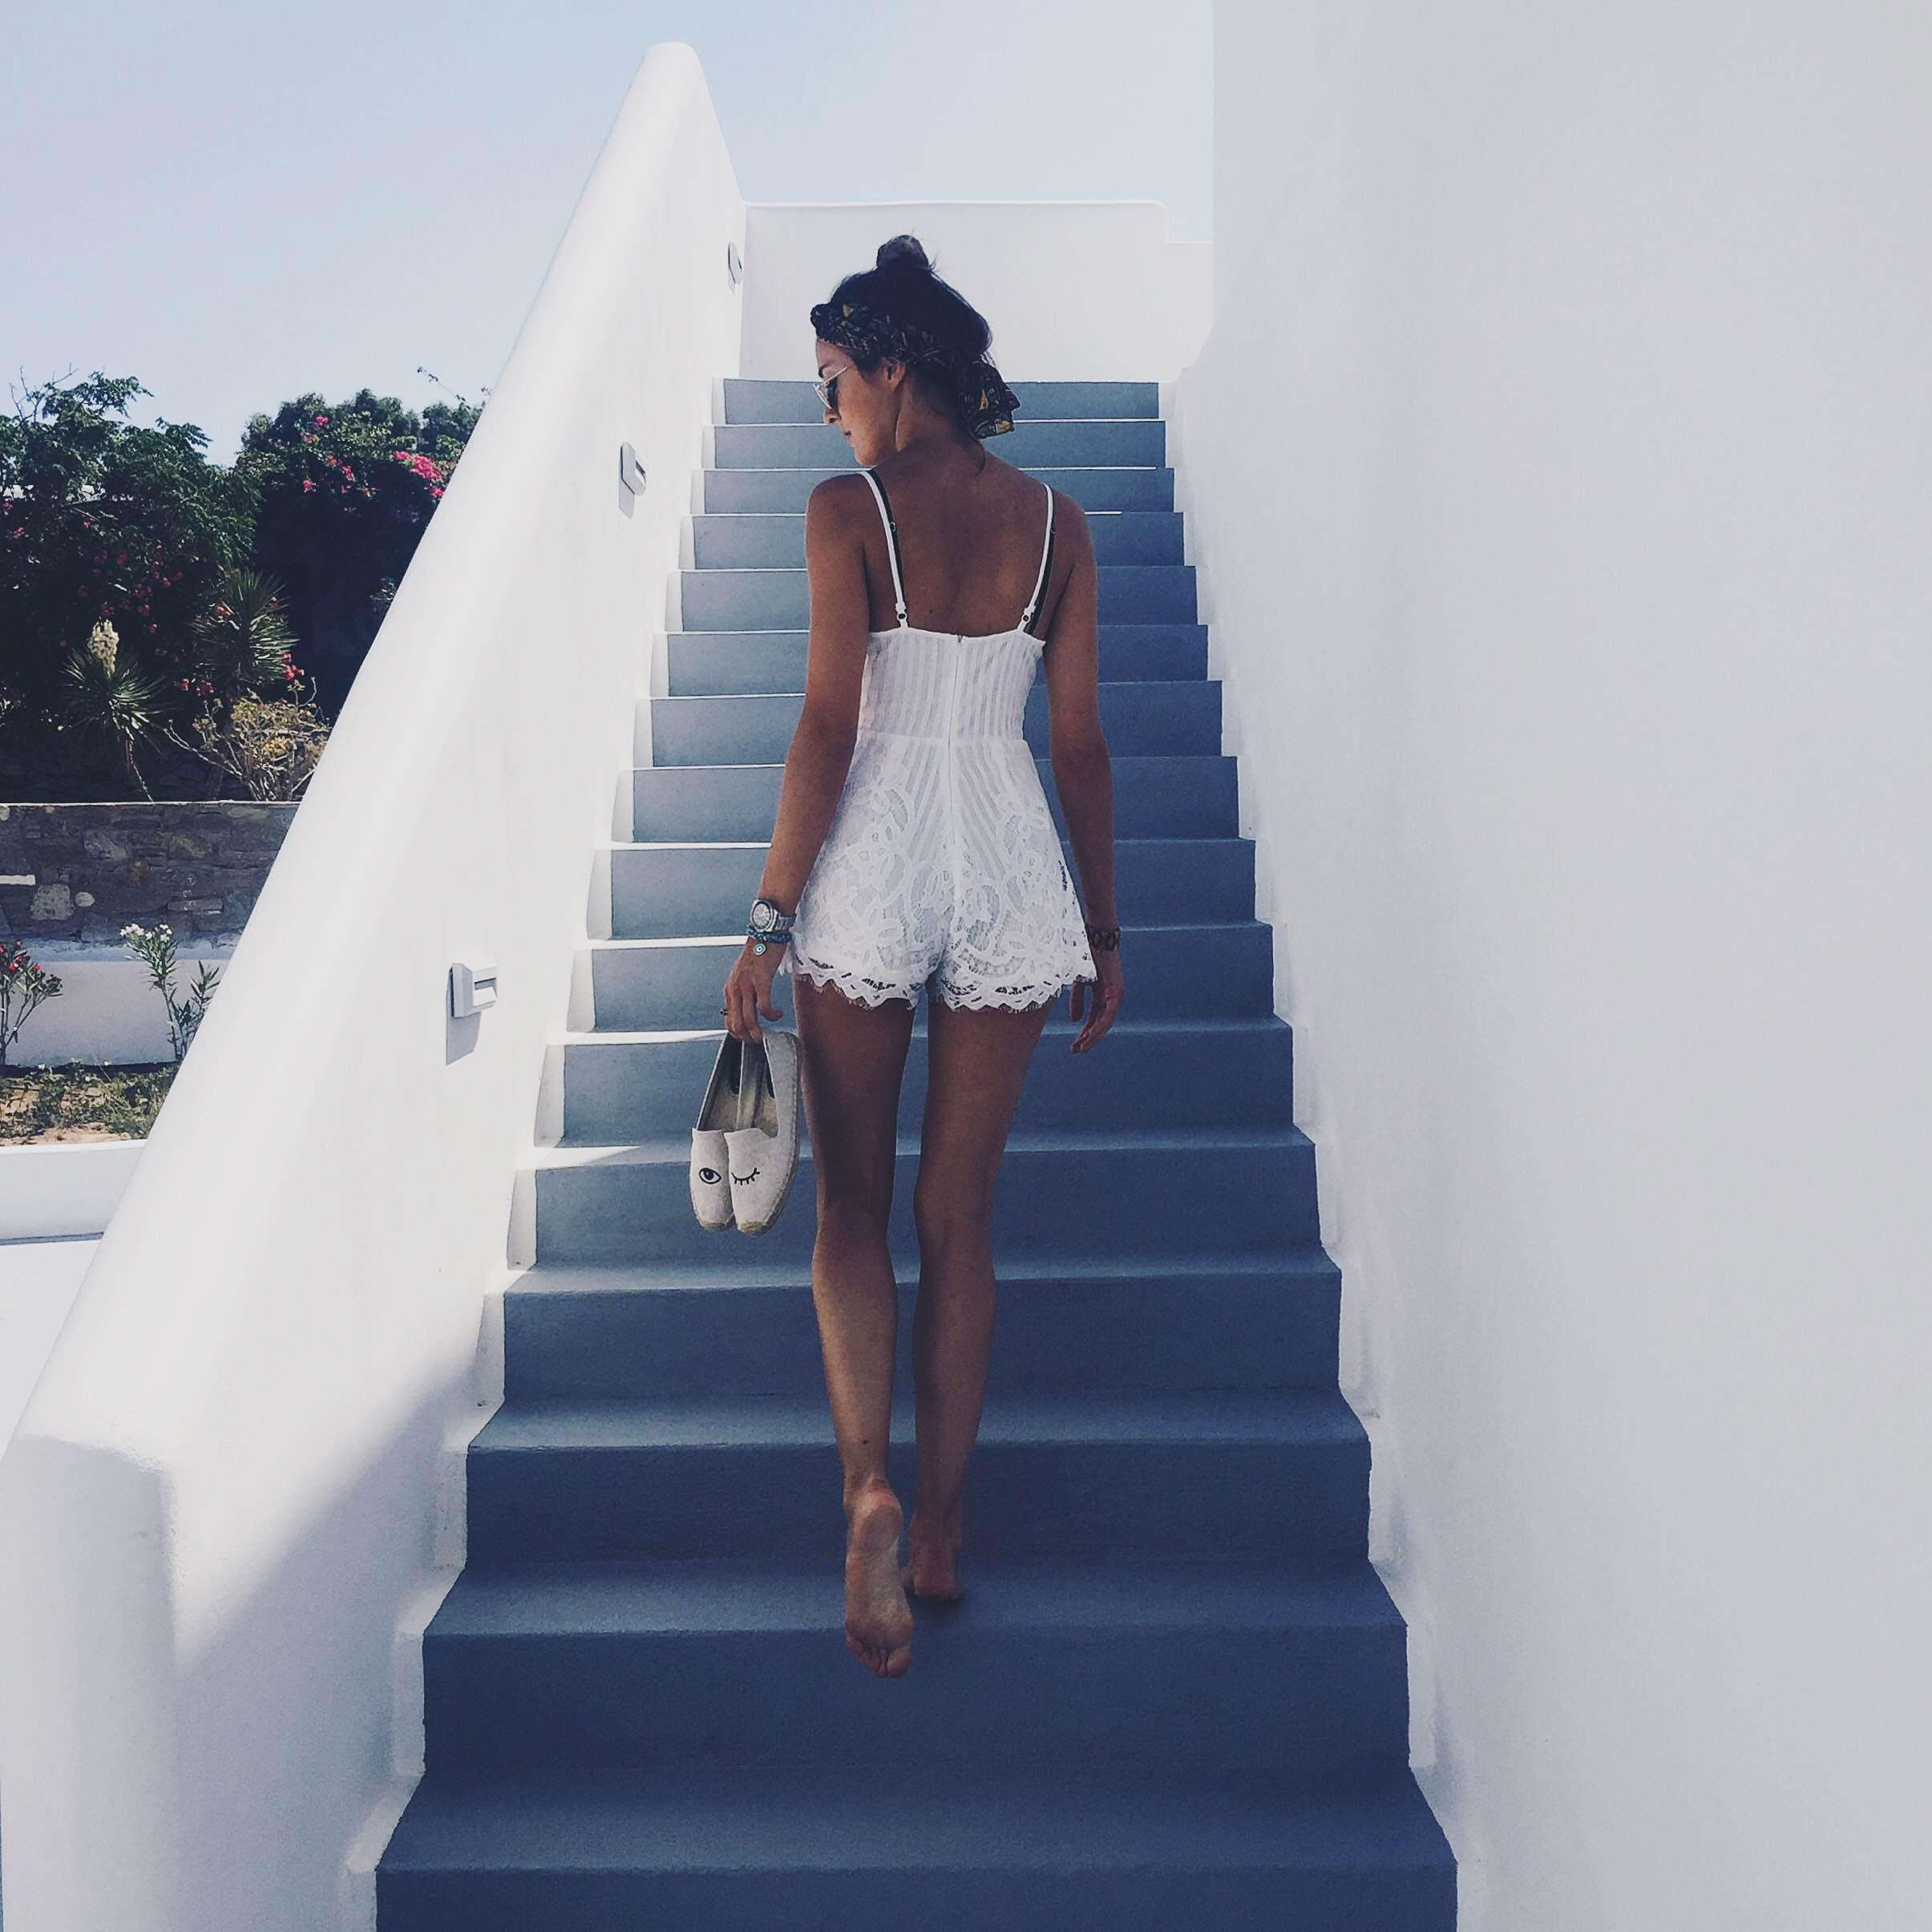 linda_tsetis_worlds_affair_summer_2016_mykonos_4